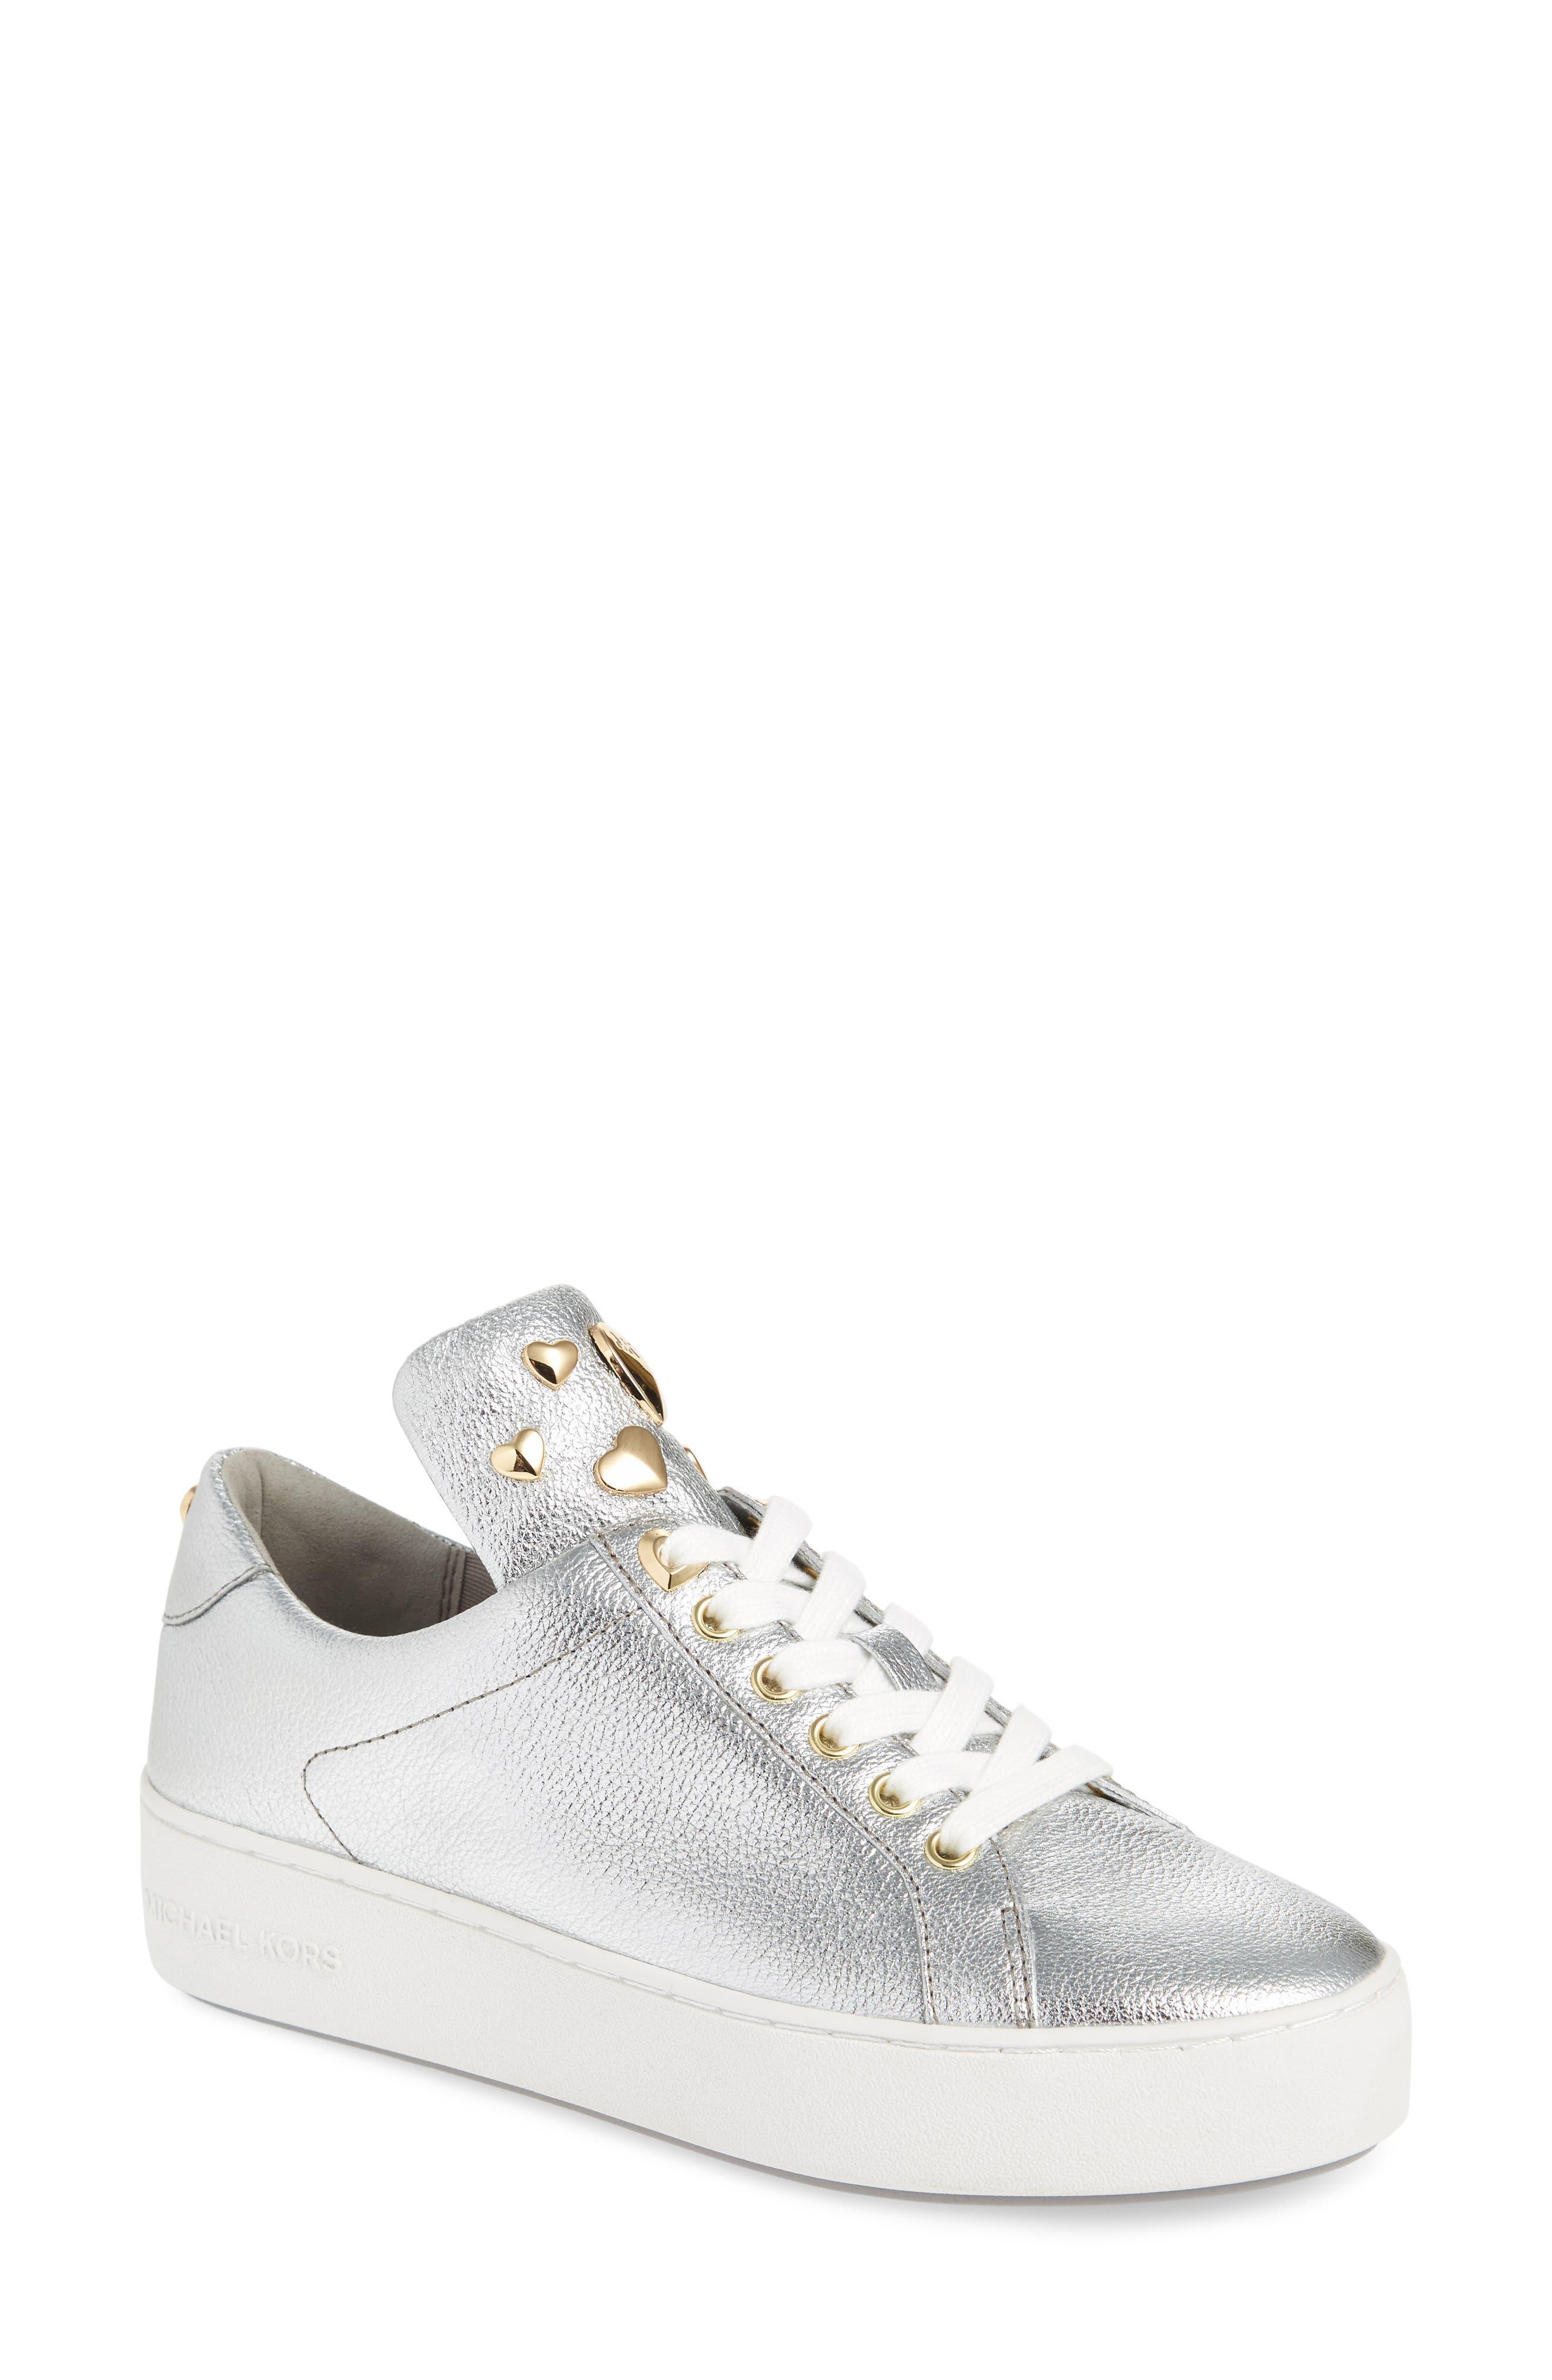 Main Image - MICHAEL Michael Kors Mindy Platform Sneaker (Women)